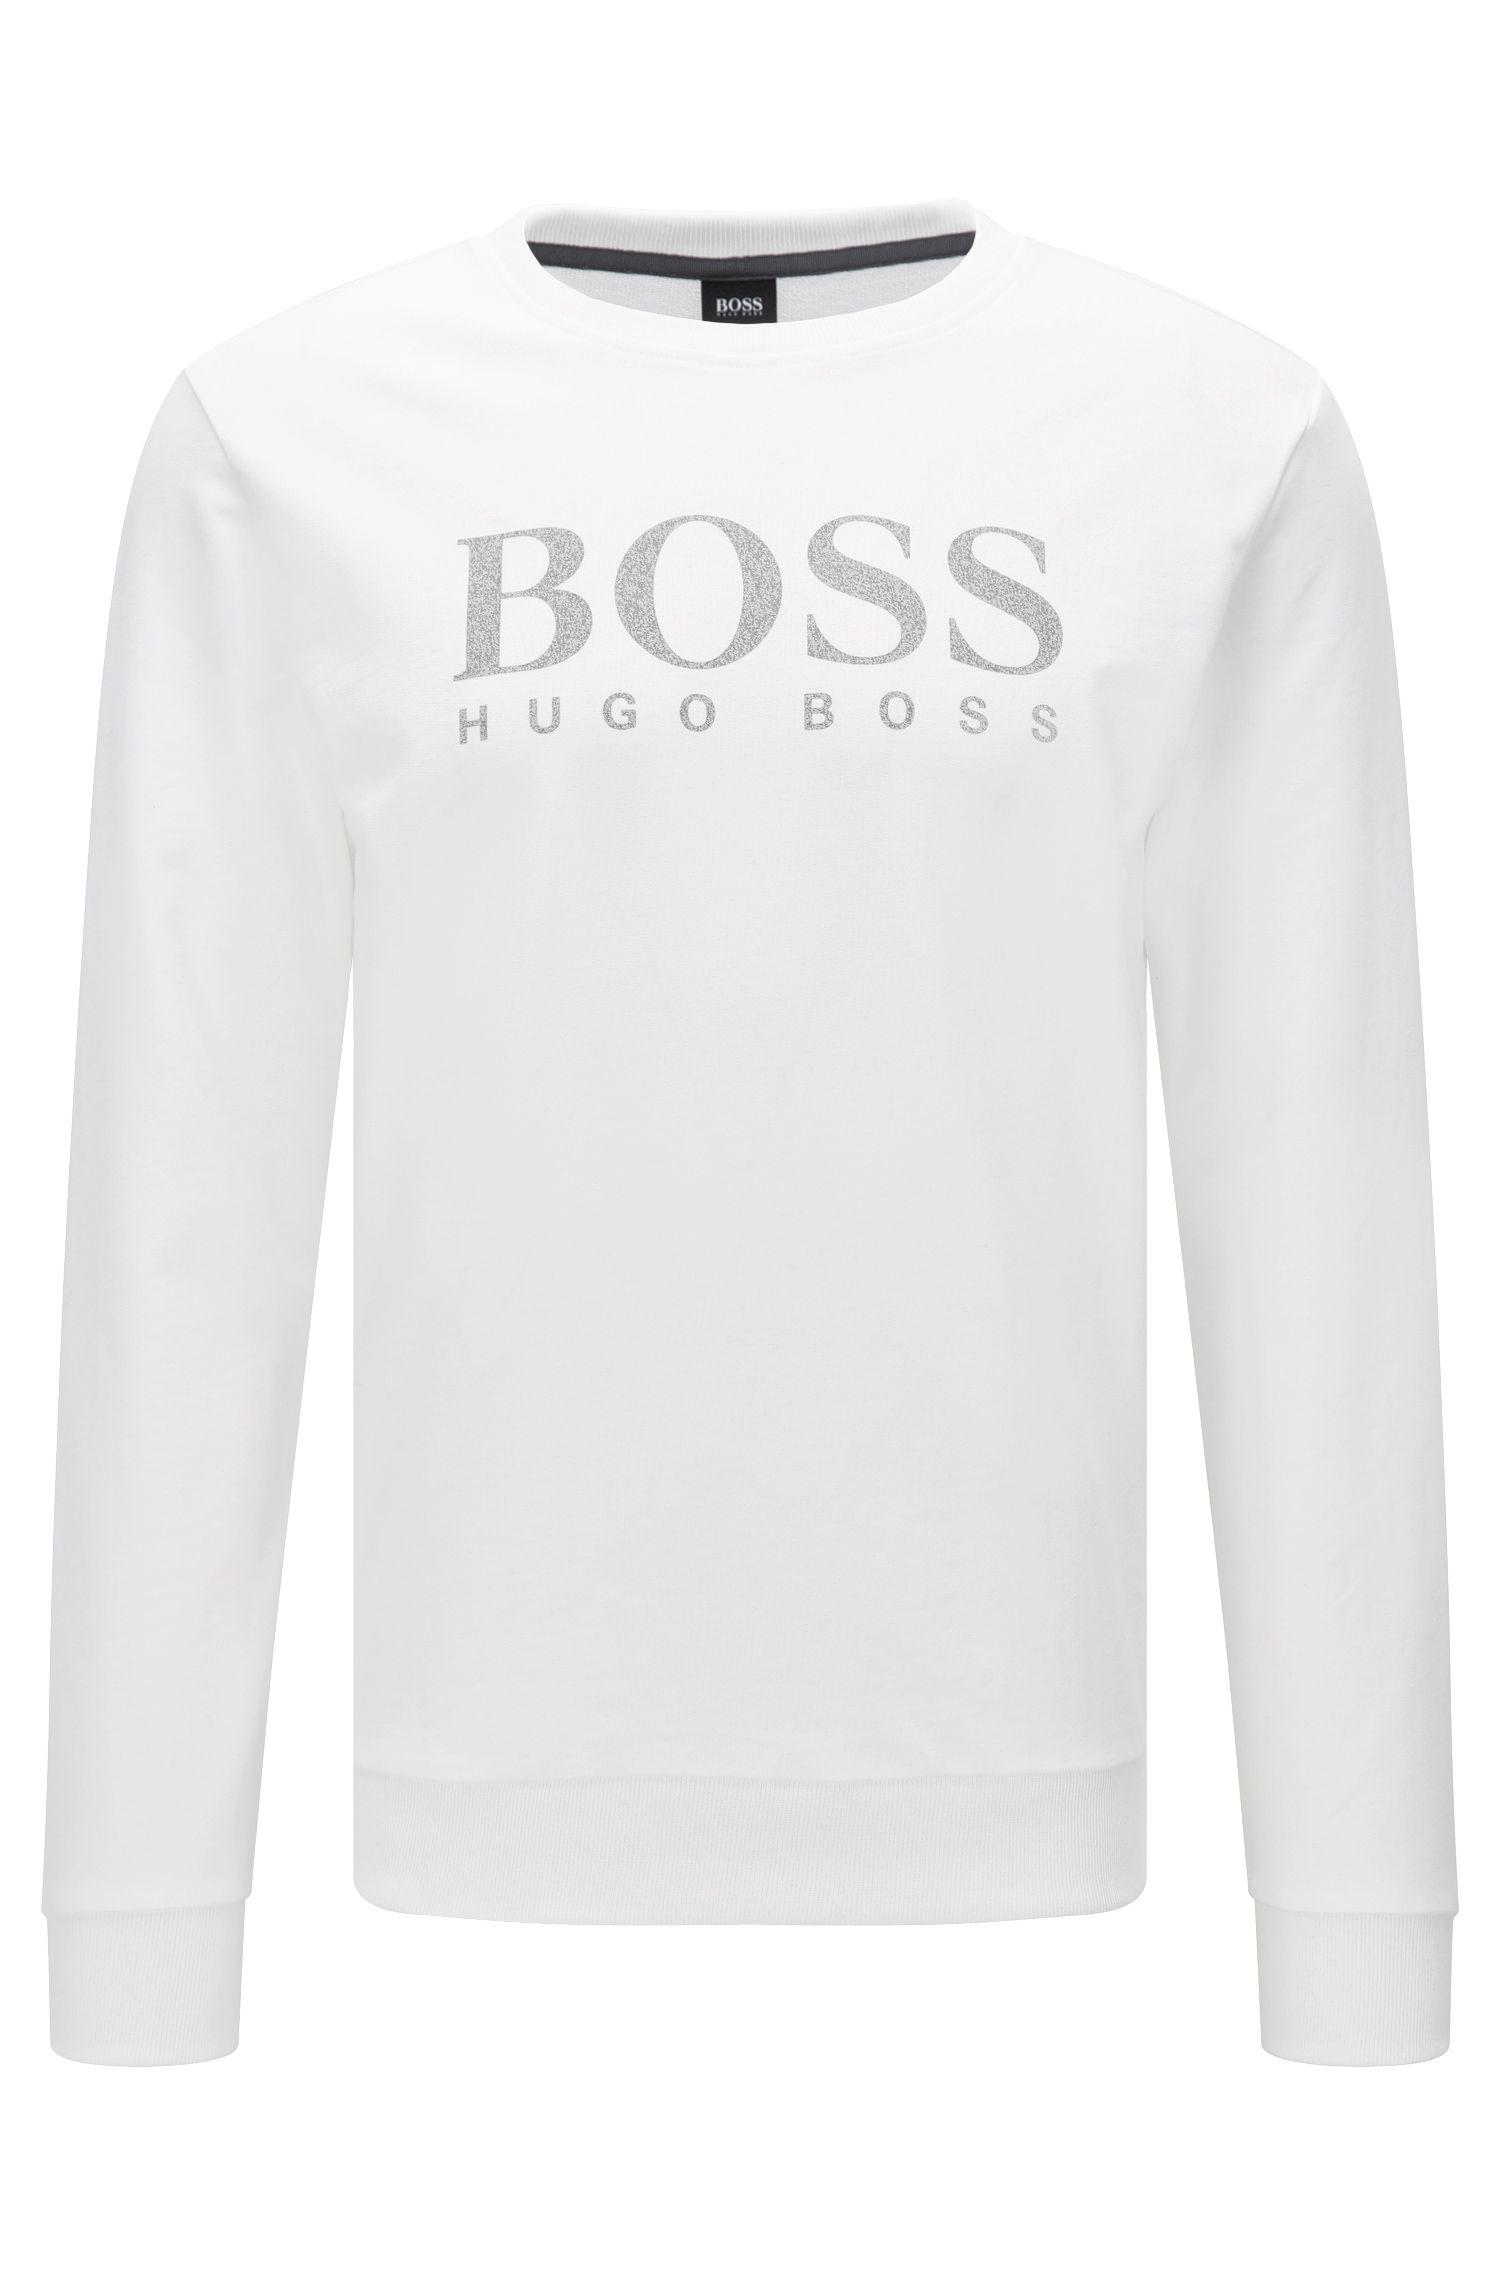 'Sweatshirt' | Logo-Print Cotton Sweatshirt